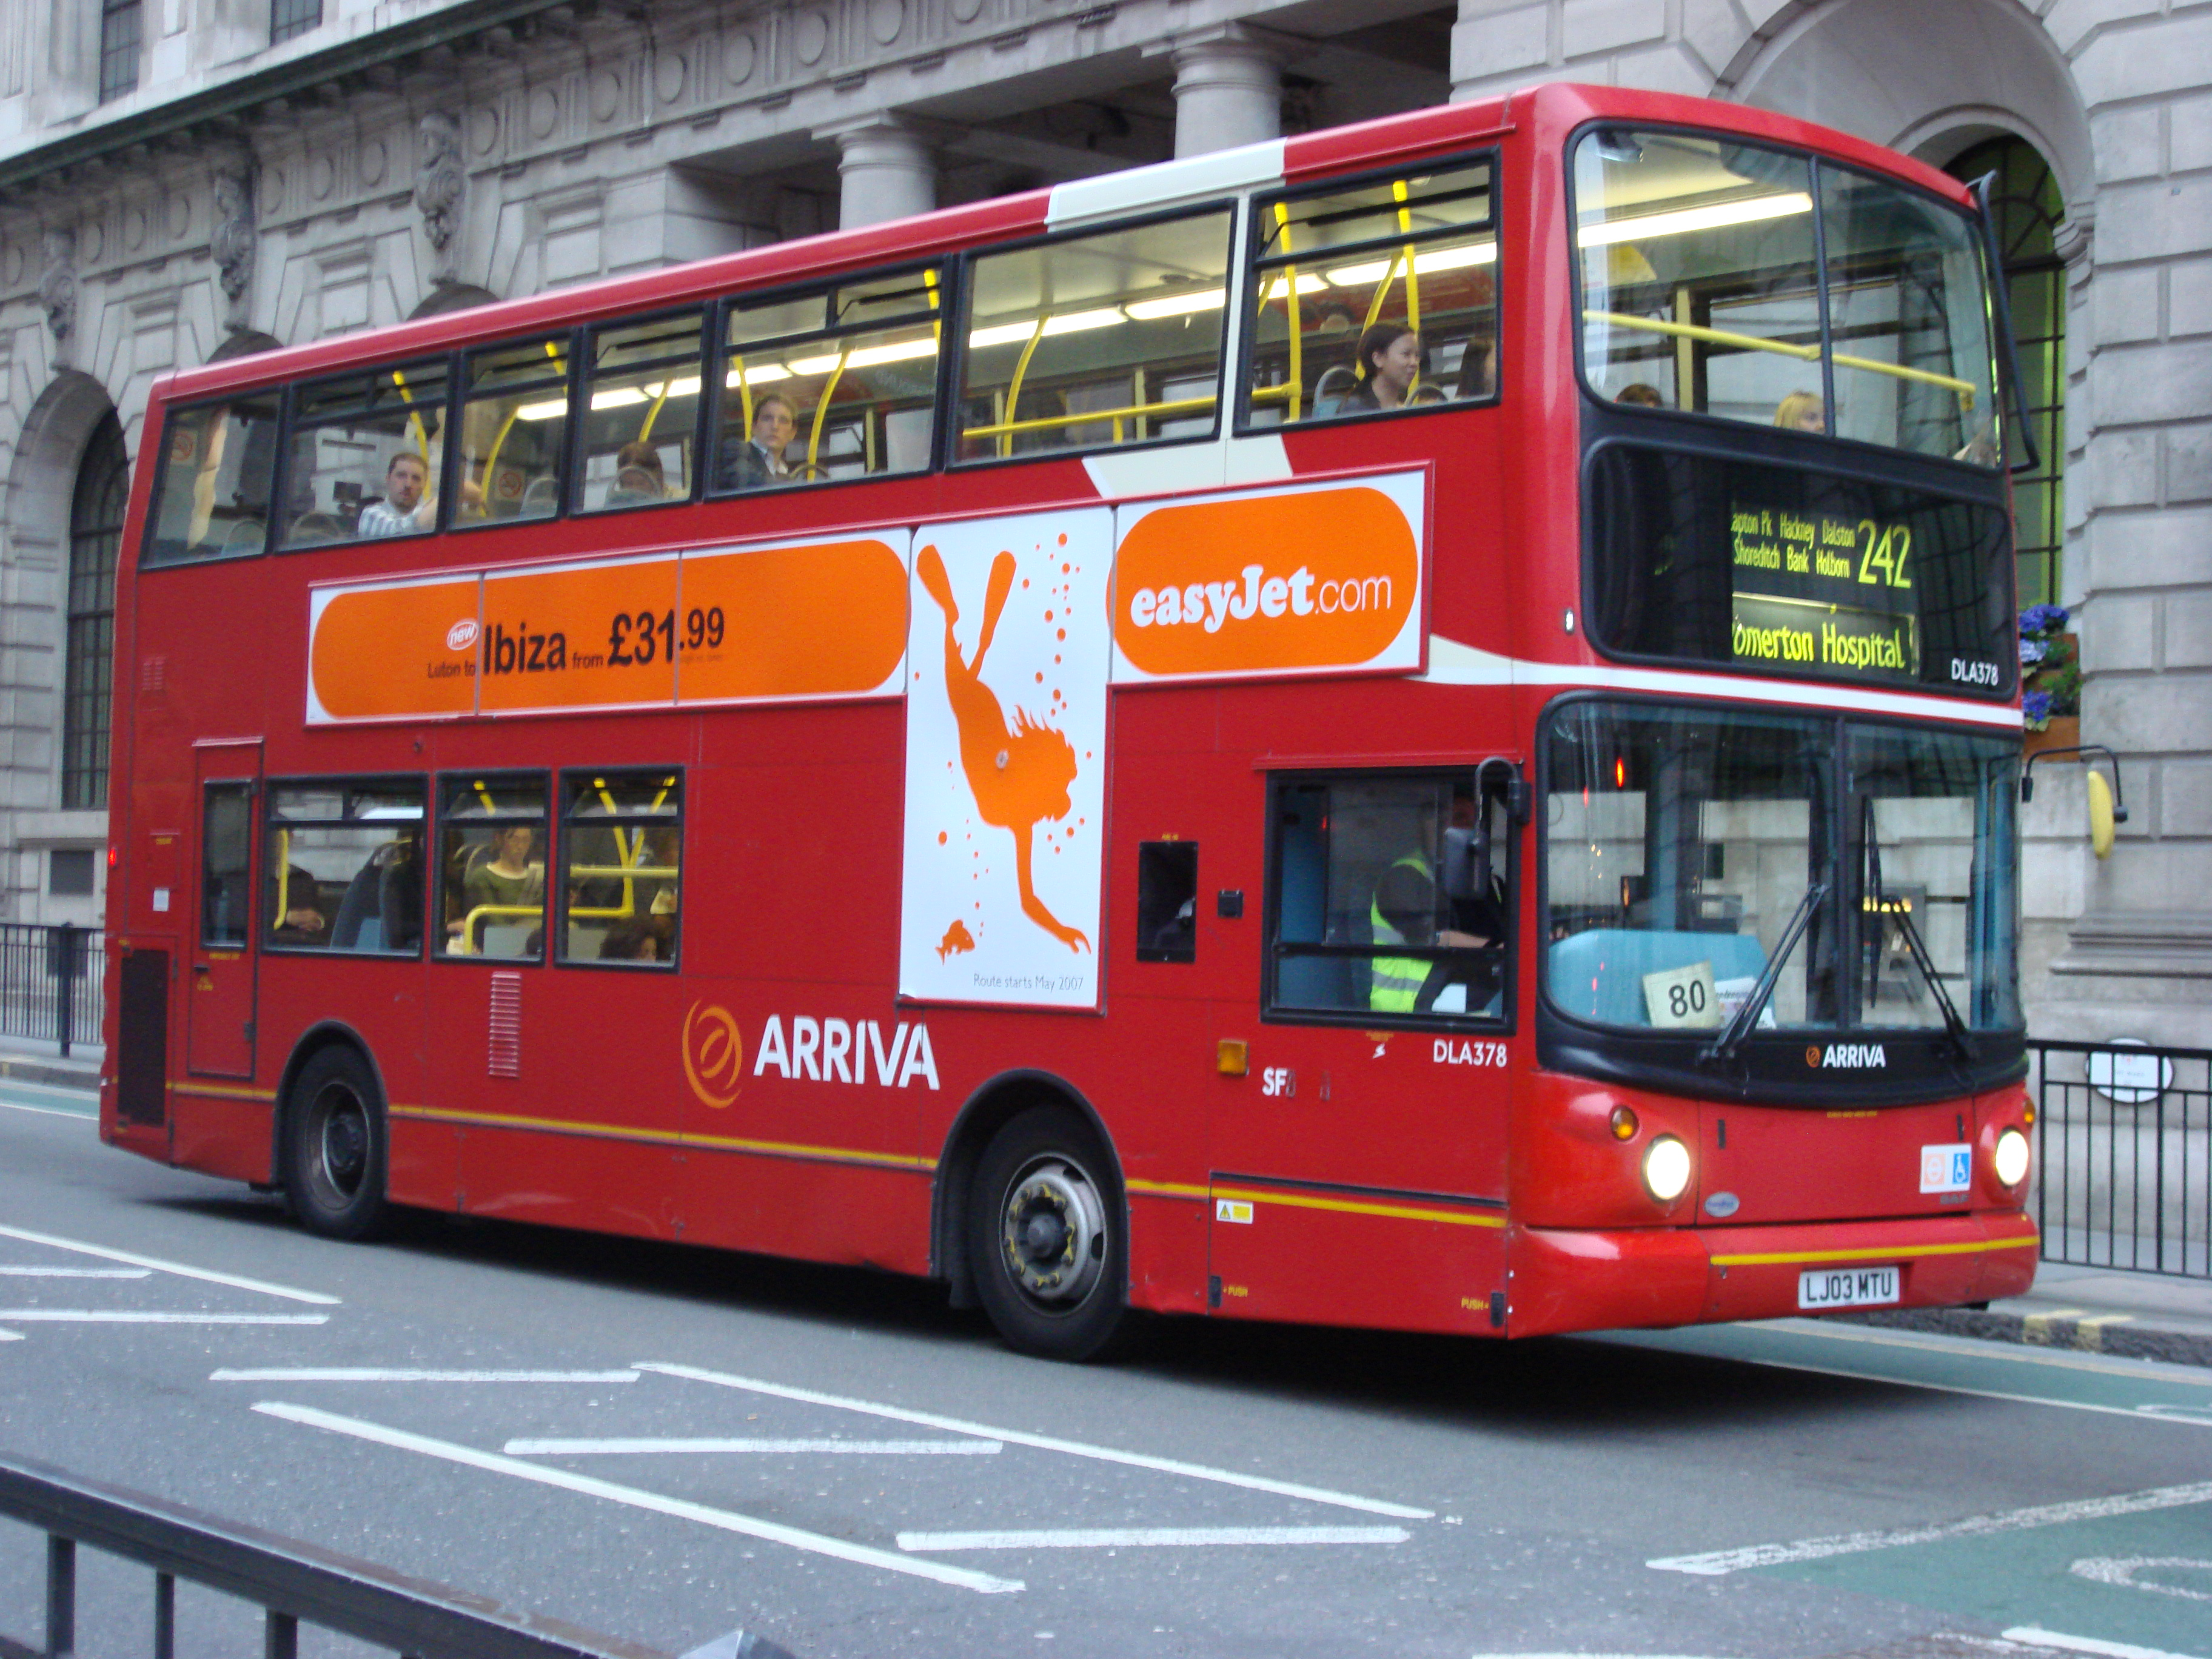 FileLondon Bus route 242jpg   Wikipedia the encyclopedia 3648x2736